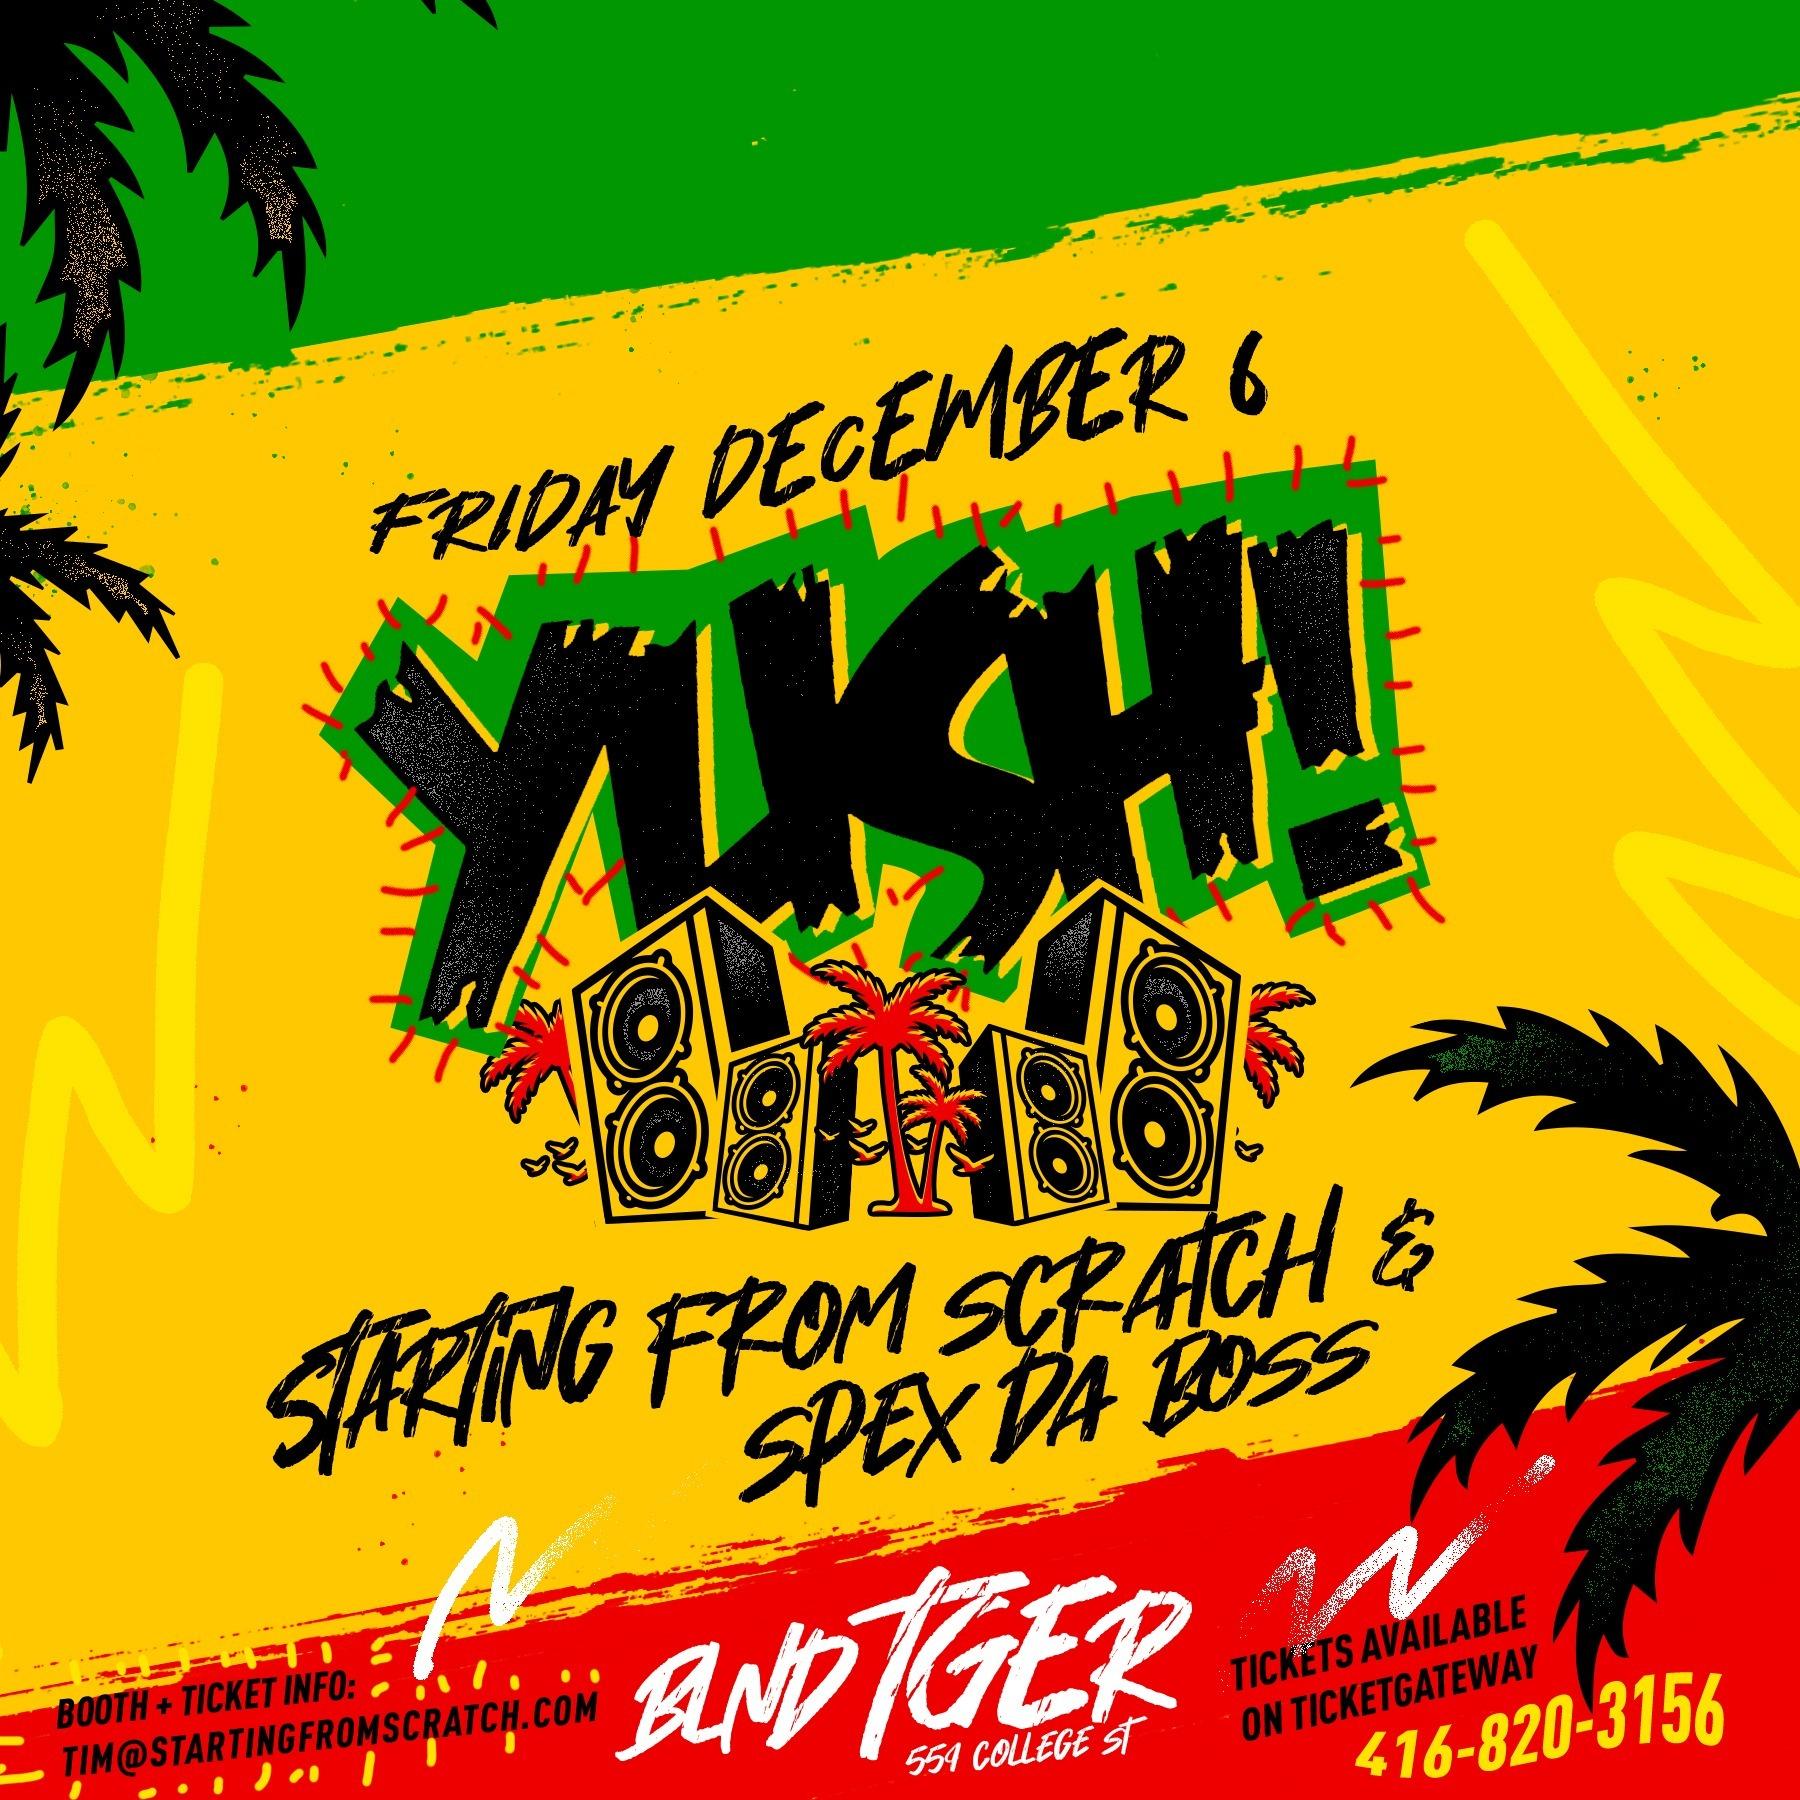 YUSH! - A Journey Through Reggae Music